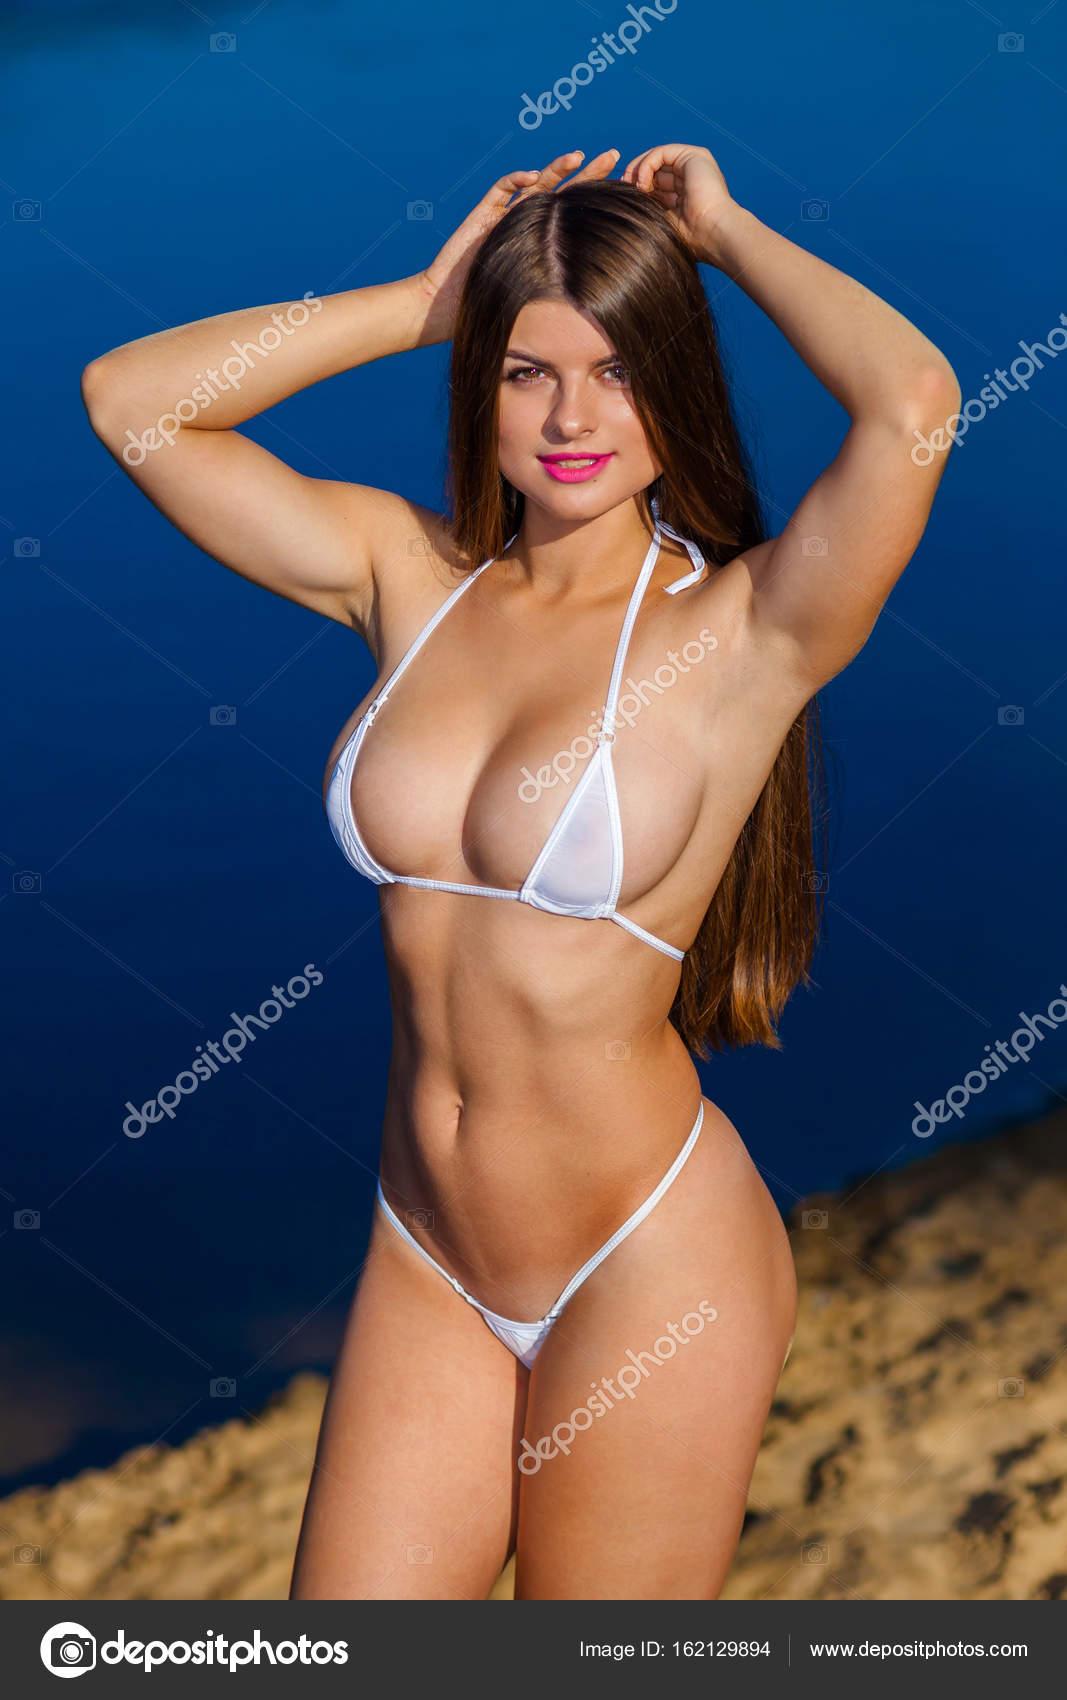 Donna incredibile bagnata in bikini. bella ragazza in bikini in ...